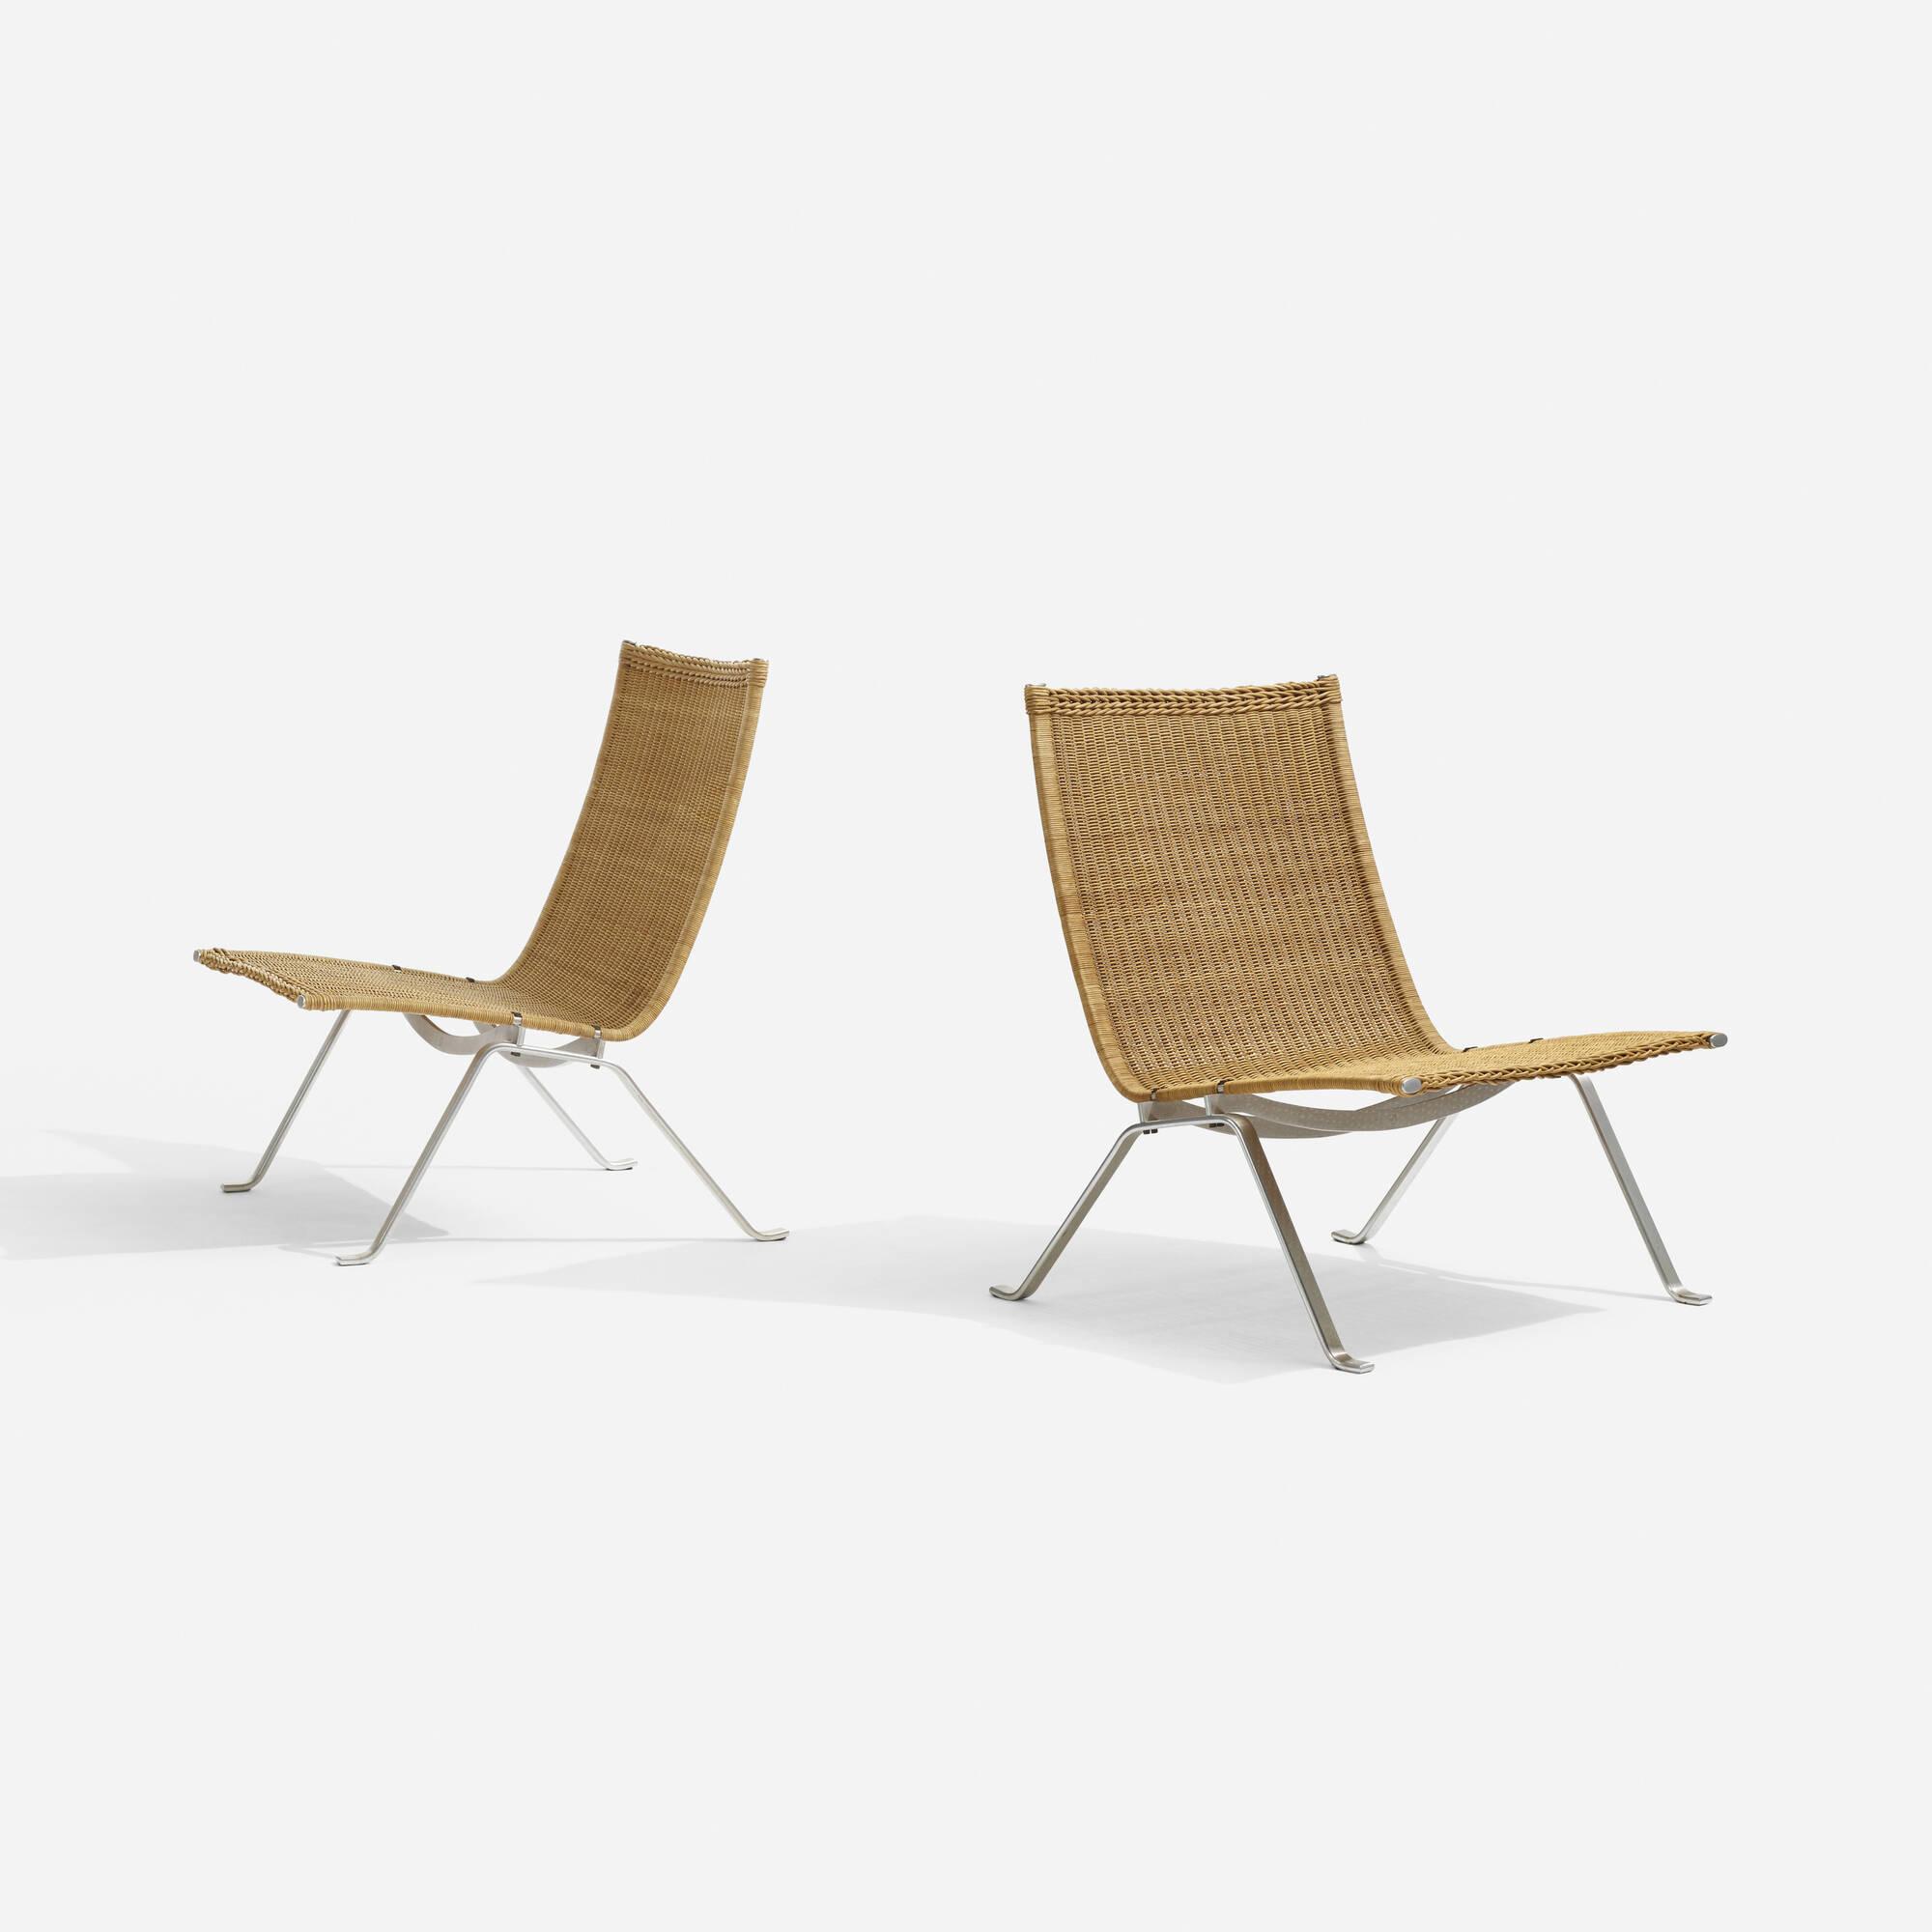 305: Poul Kjaerholm / PK-22 chairs, pair (2 of 4)